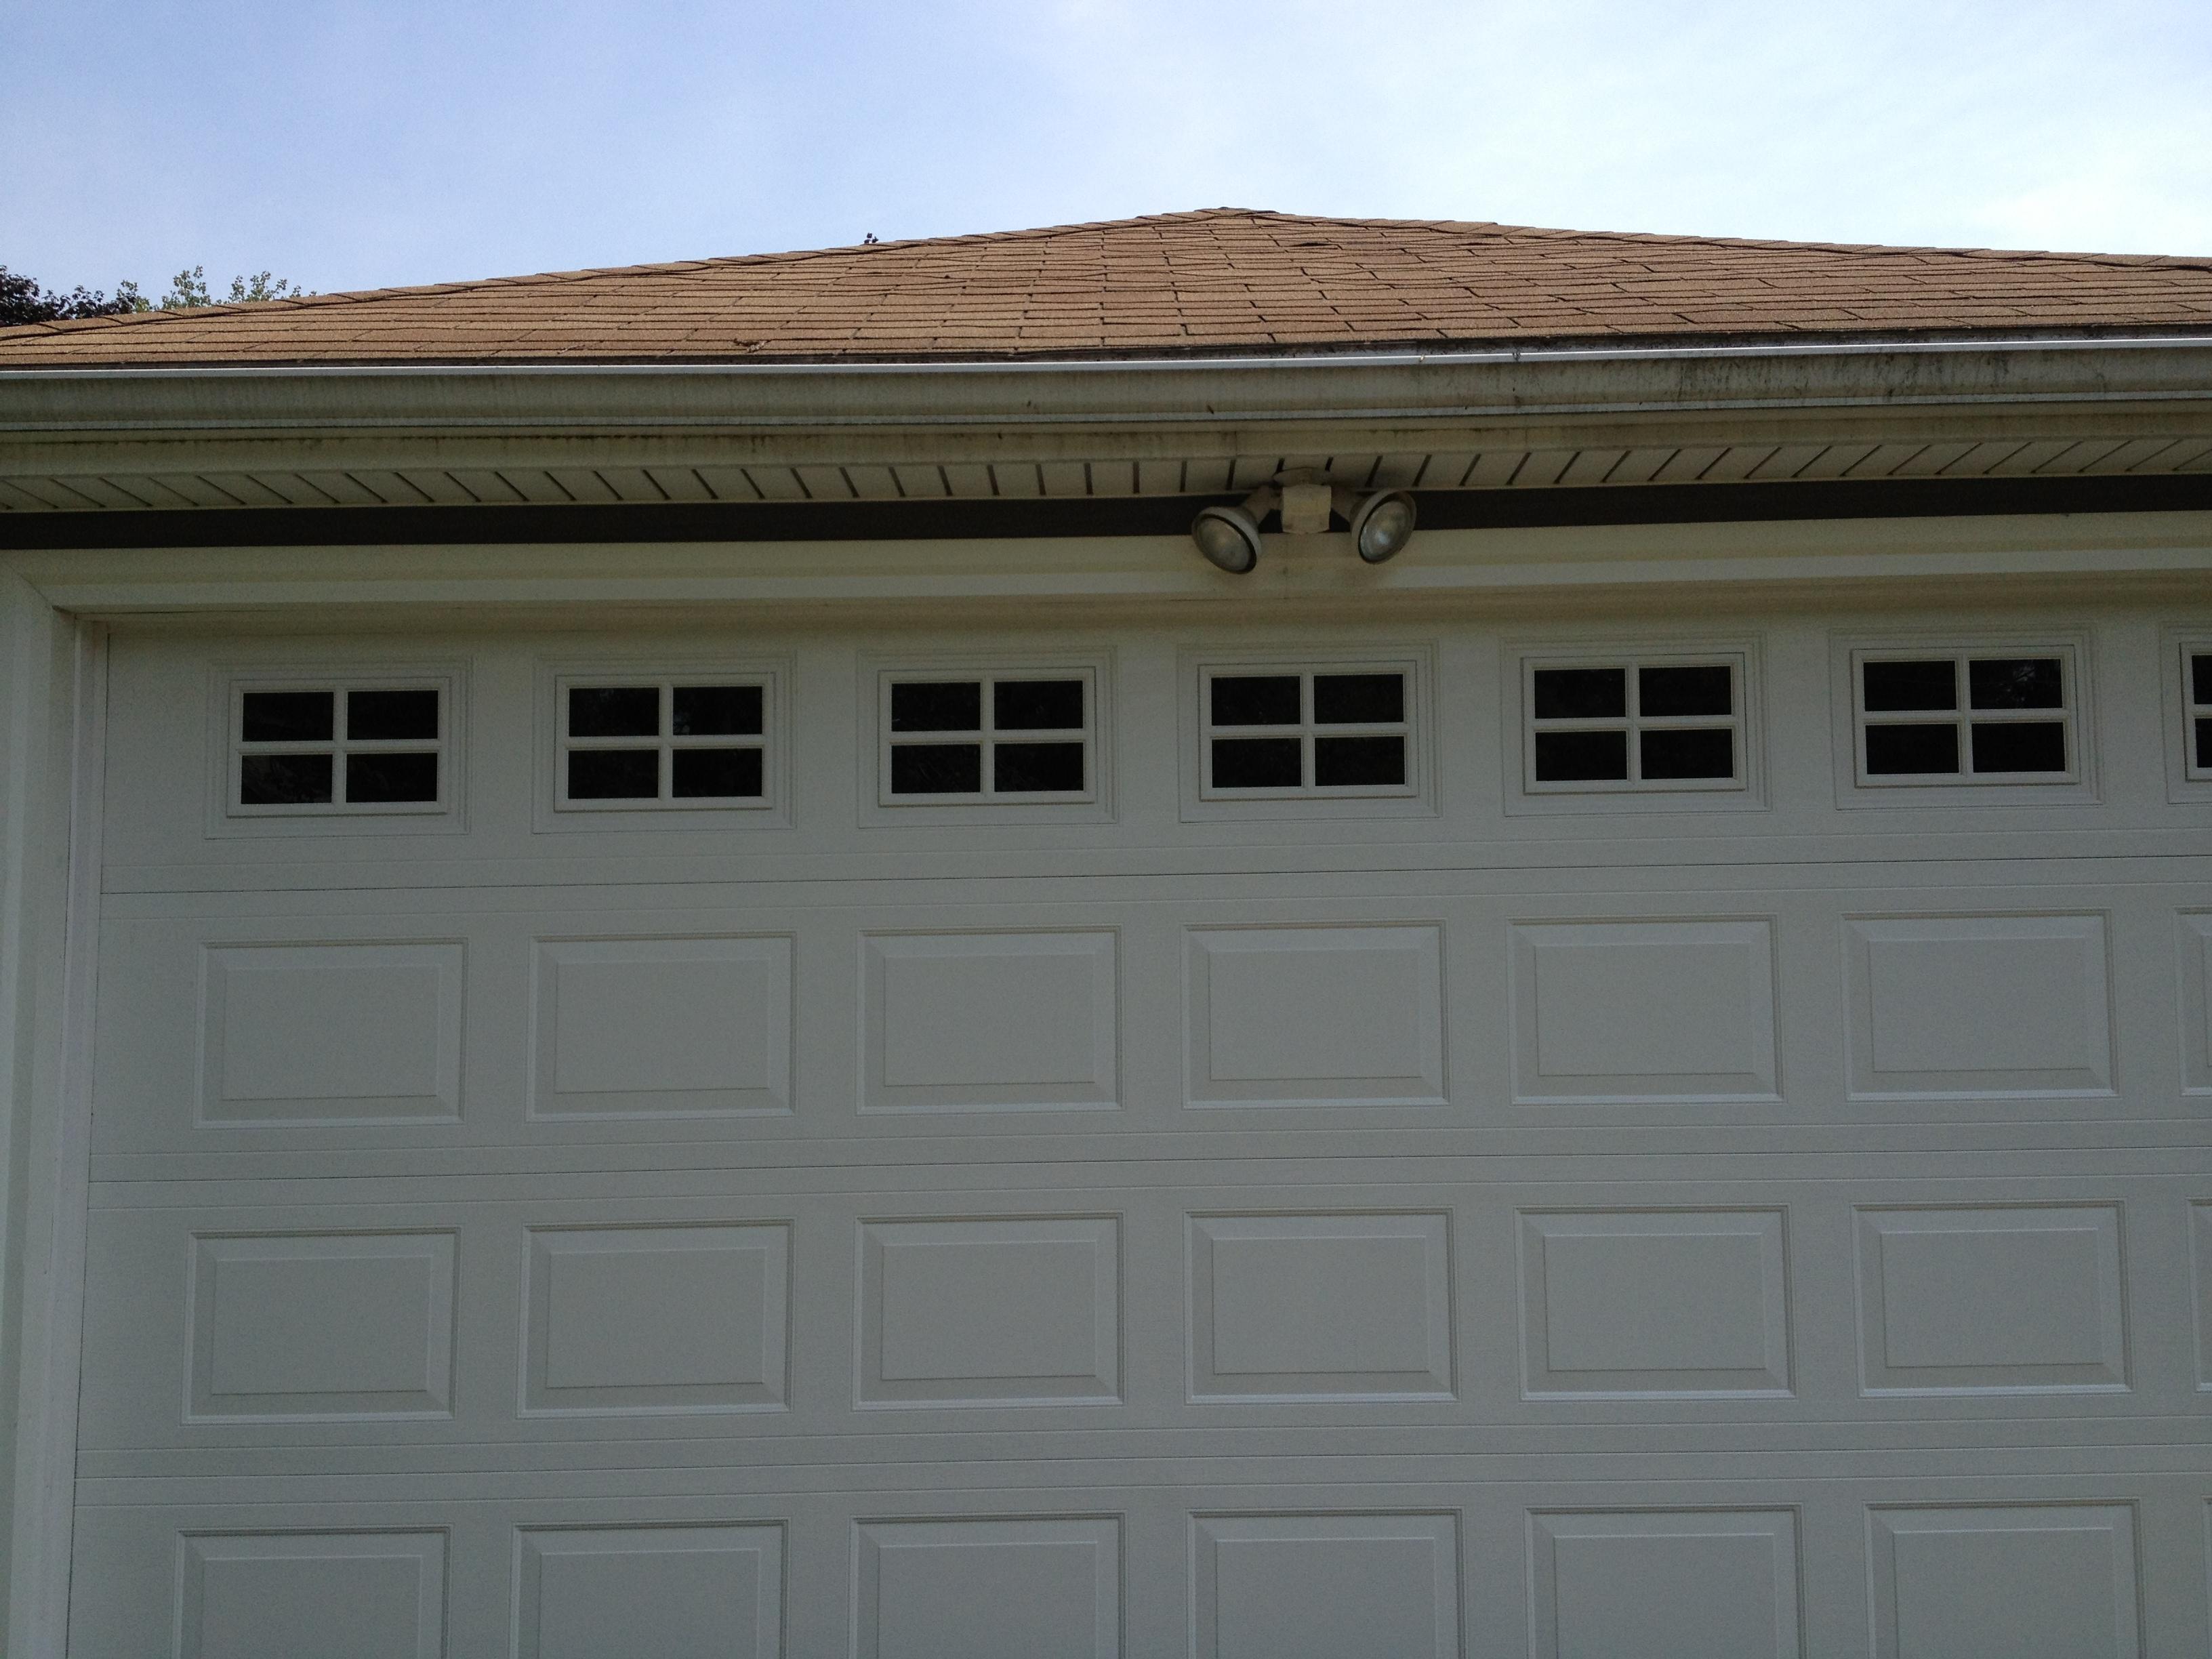 Garage door done really u and friday favorites okay kaye